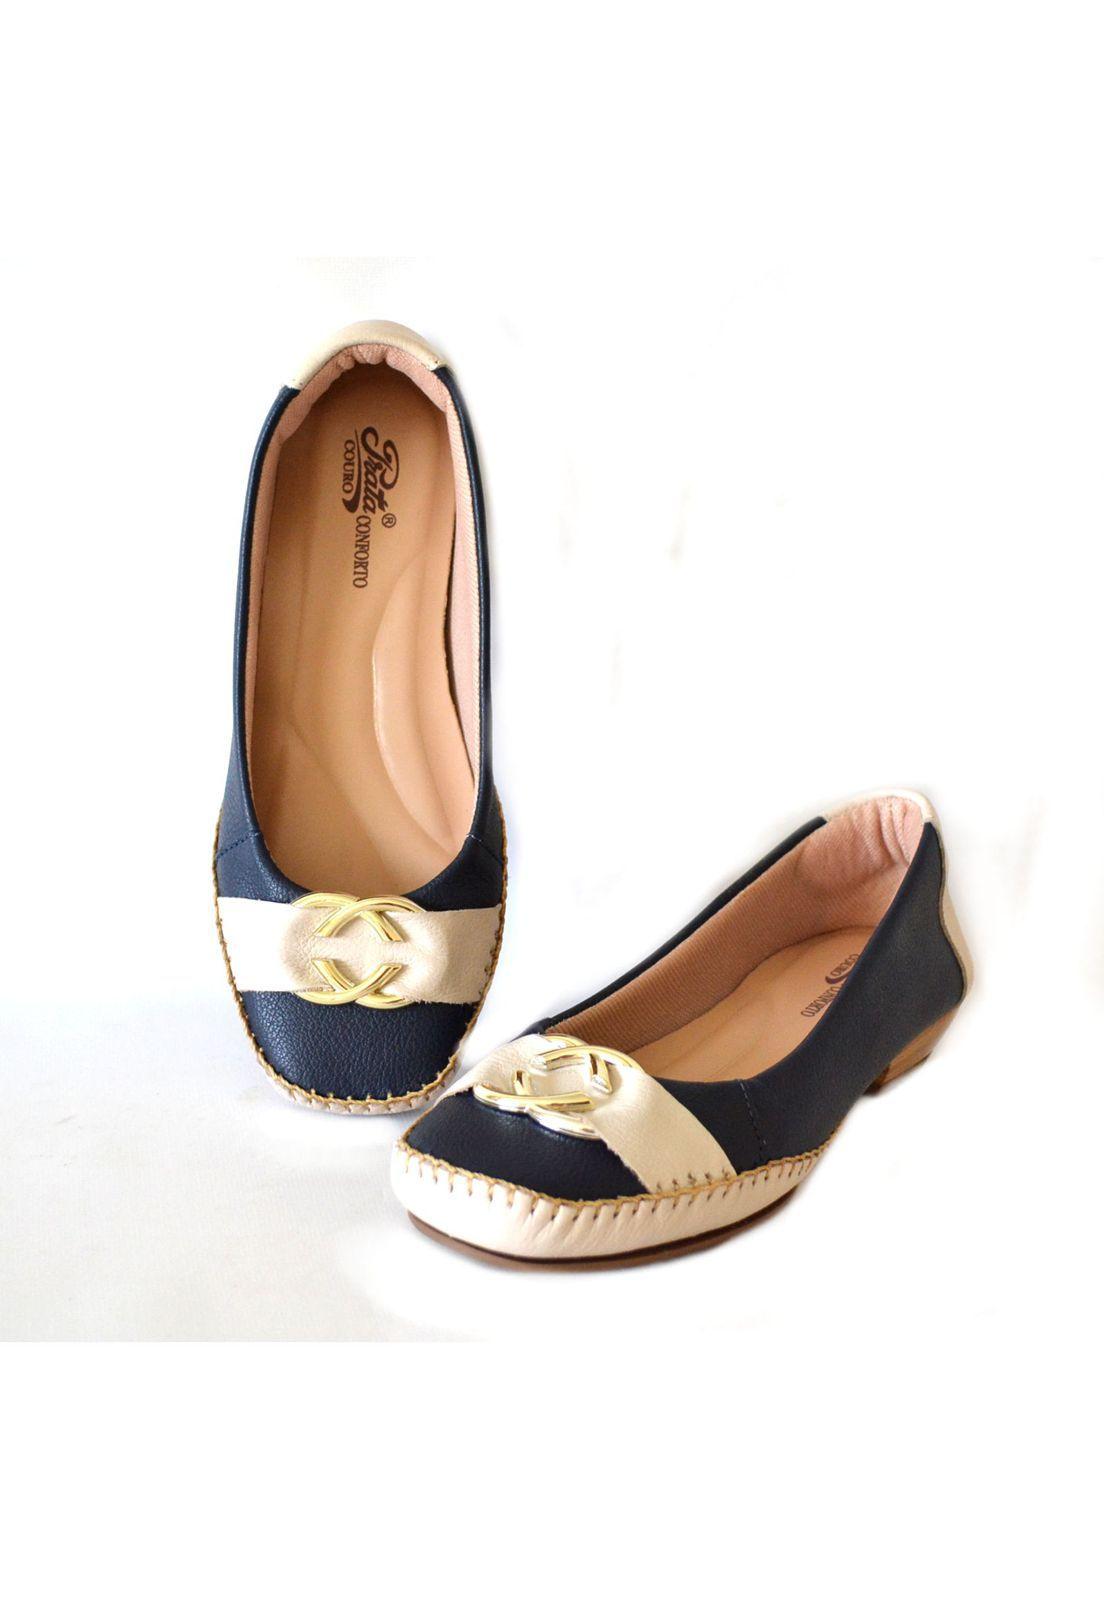 Sapato Prata Couro Conforto Marinho/Marfim 1009596